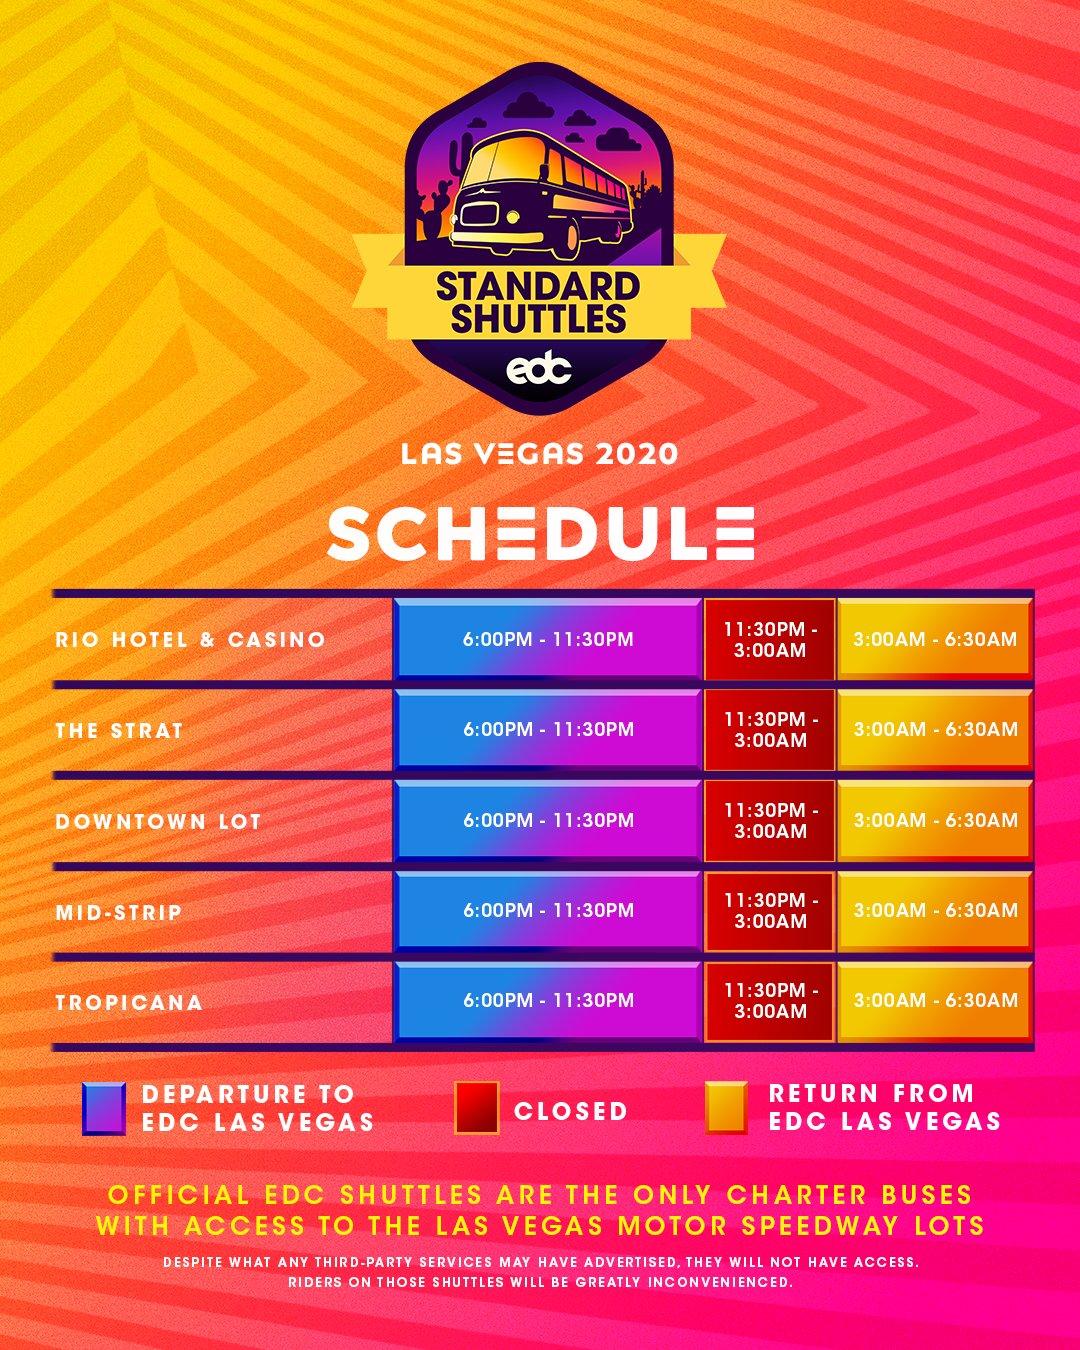 EDC Las Vegas 2020 Standard Shuttle Schedule